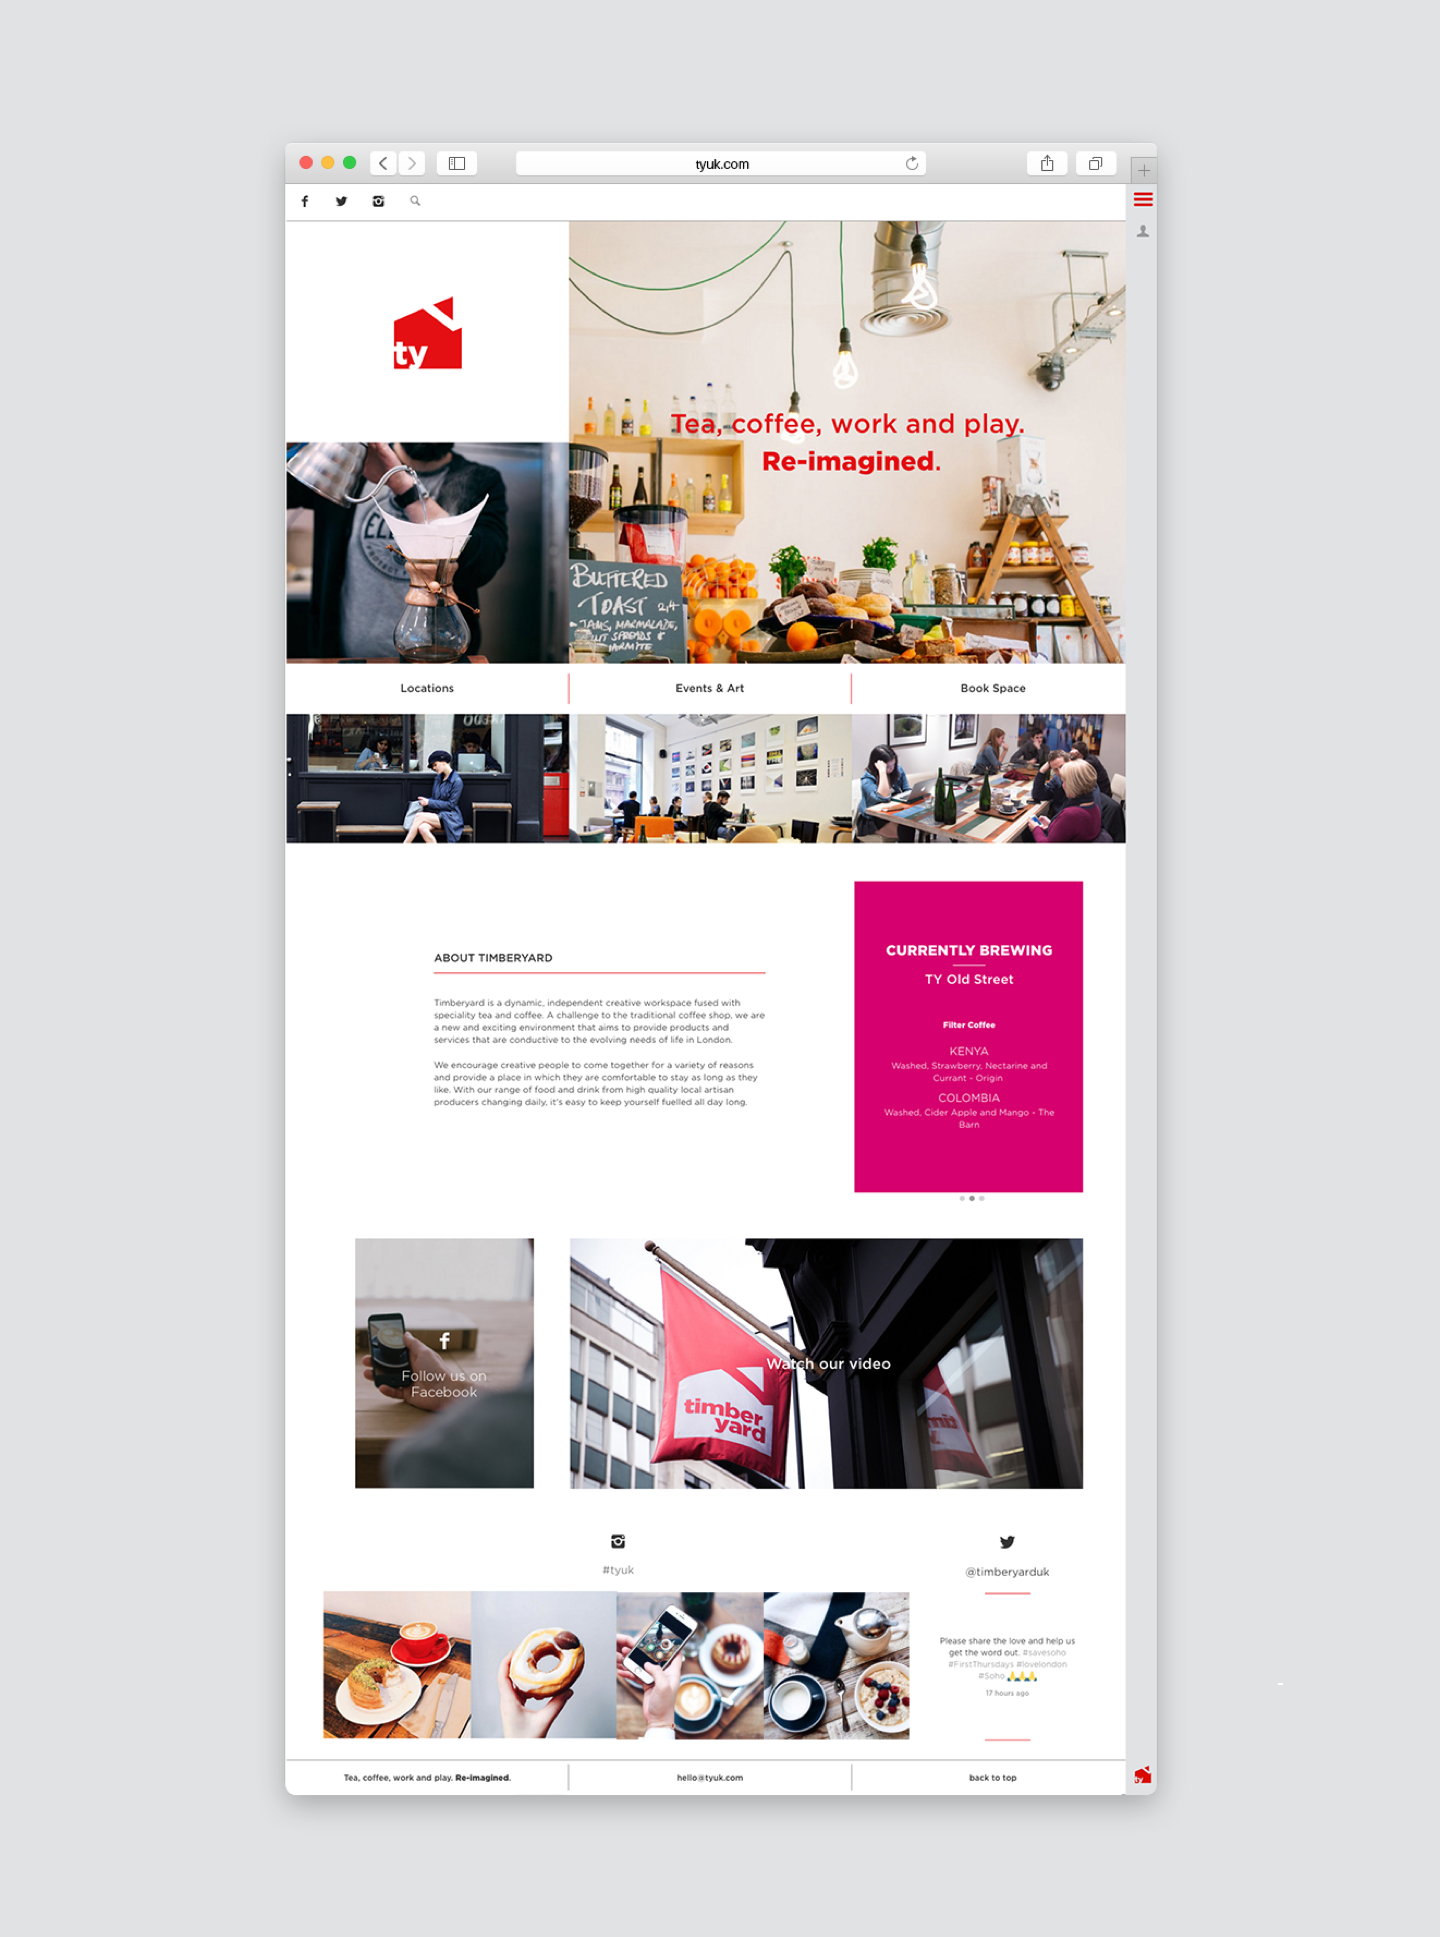 timberyard_desktop